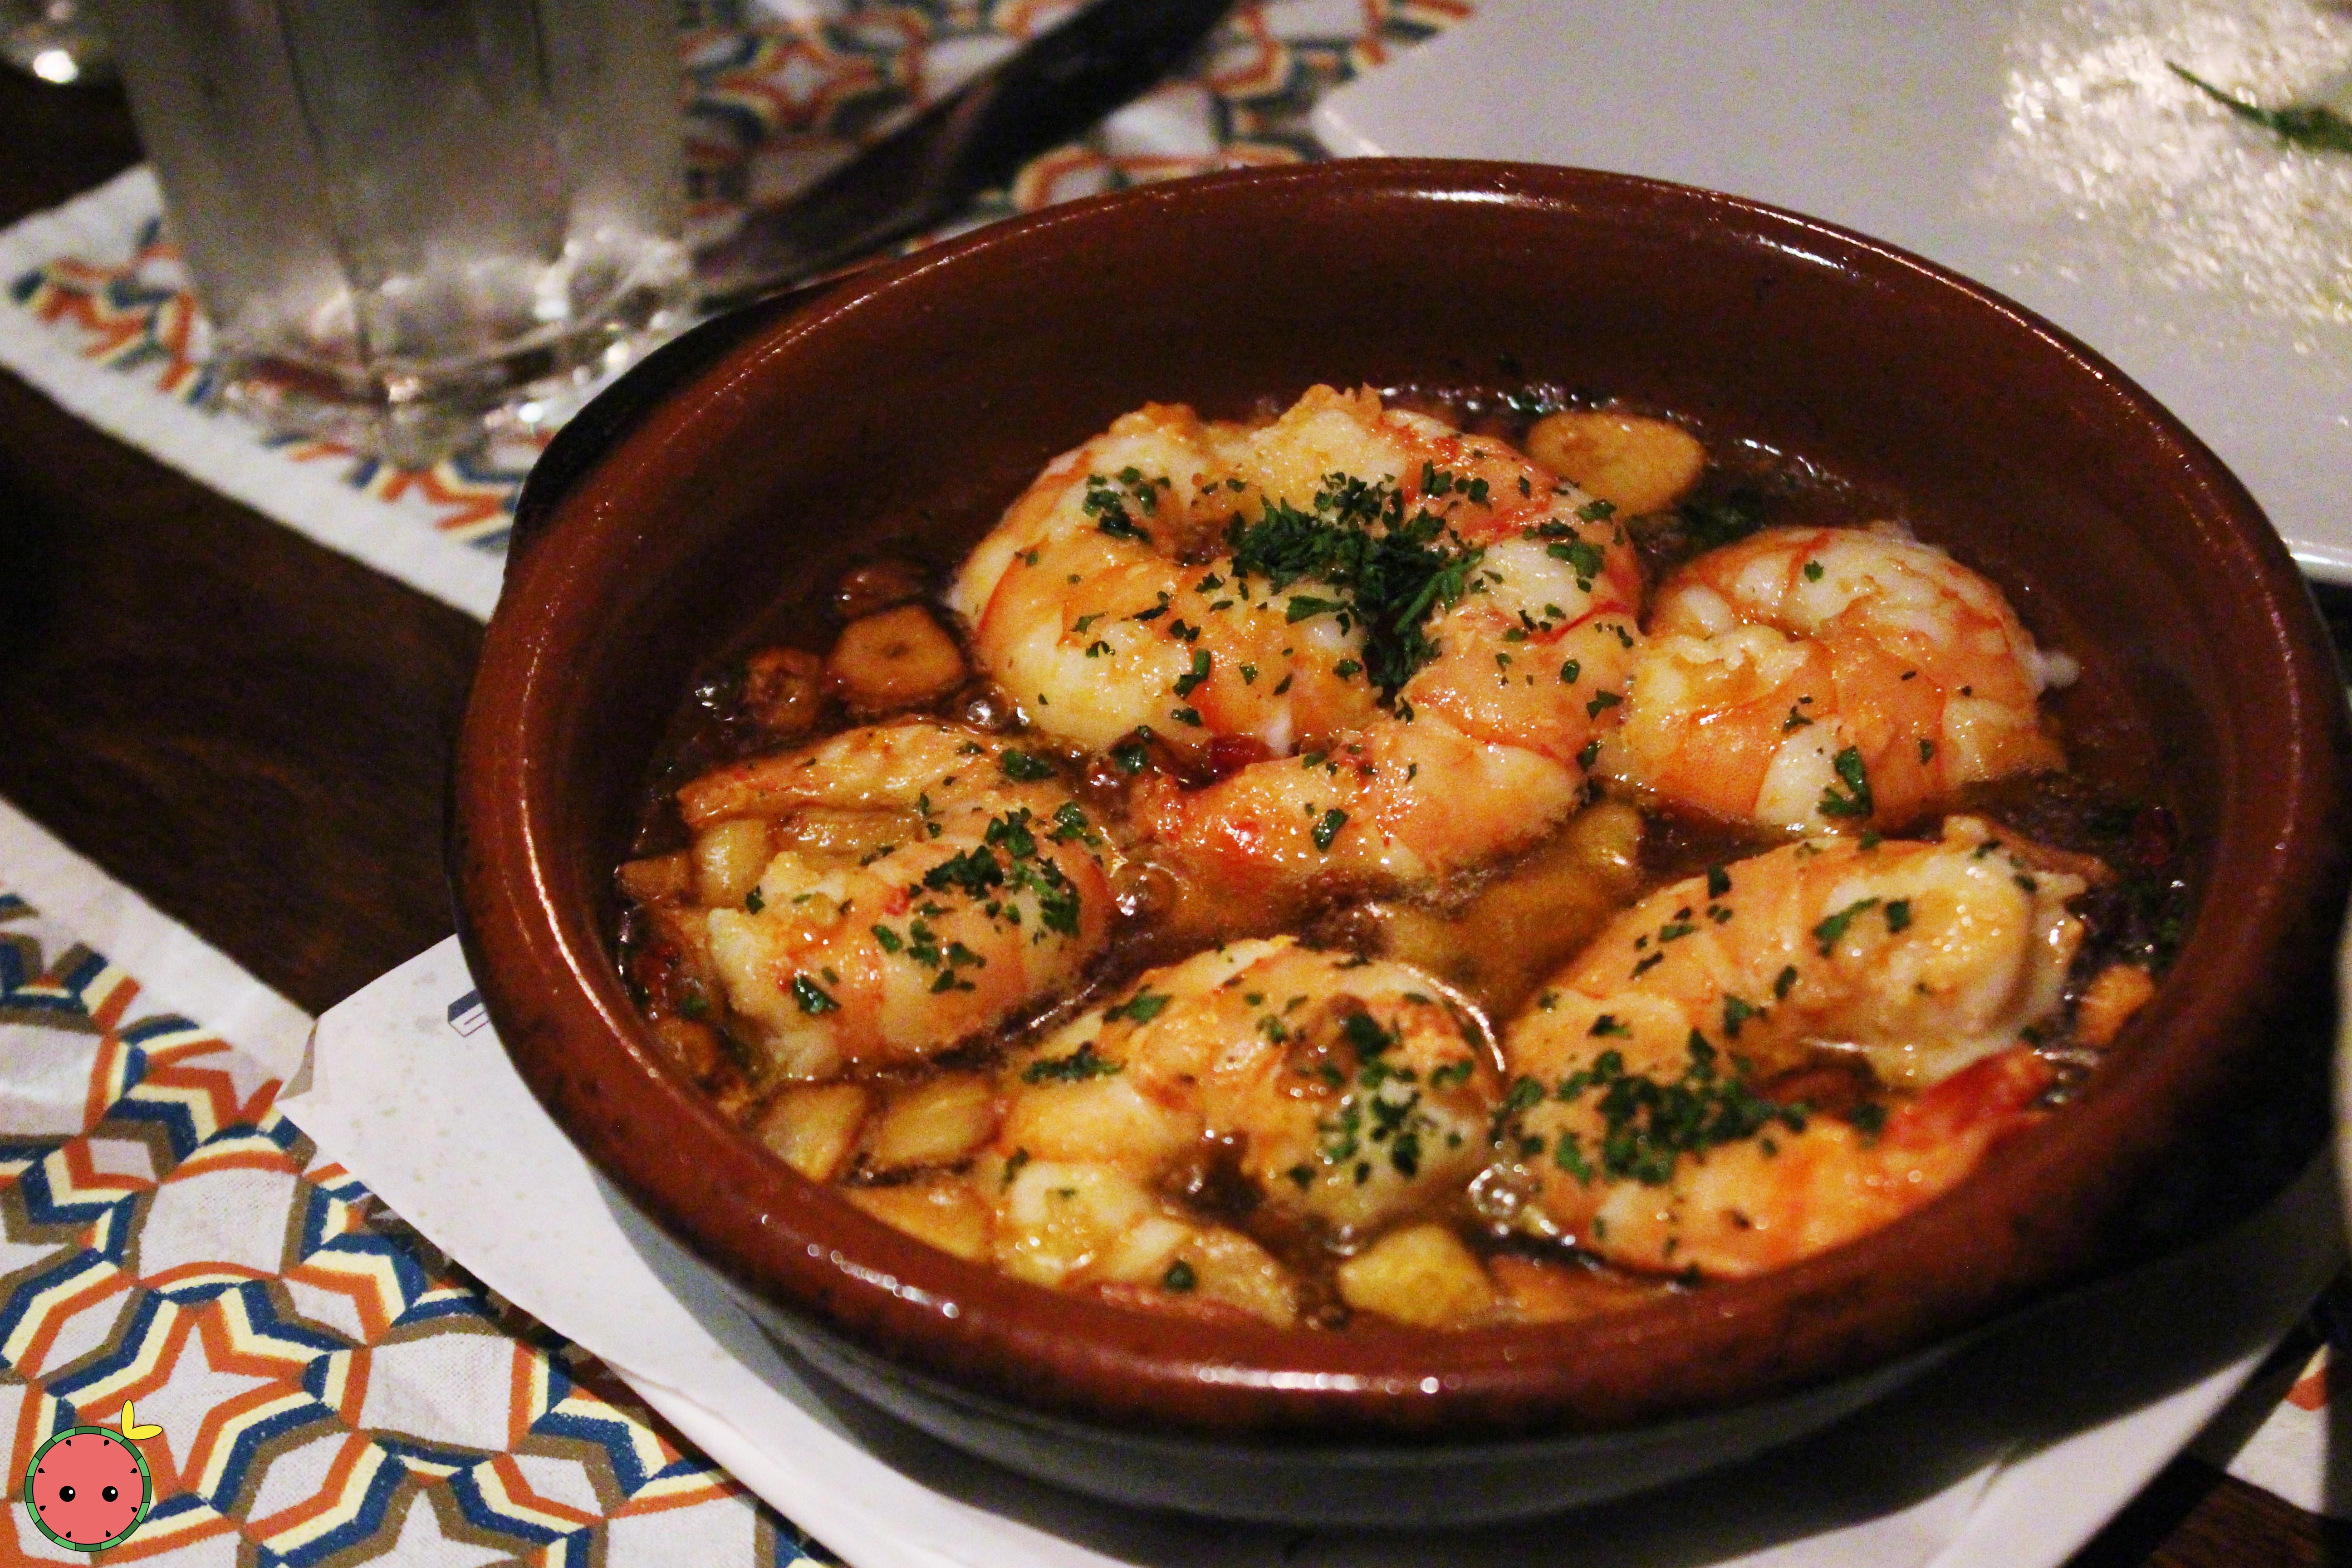 Gambas al Ajillo - Spicy garlic fried shrimps in olive oil